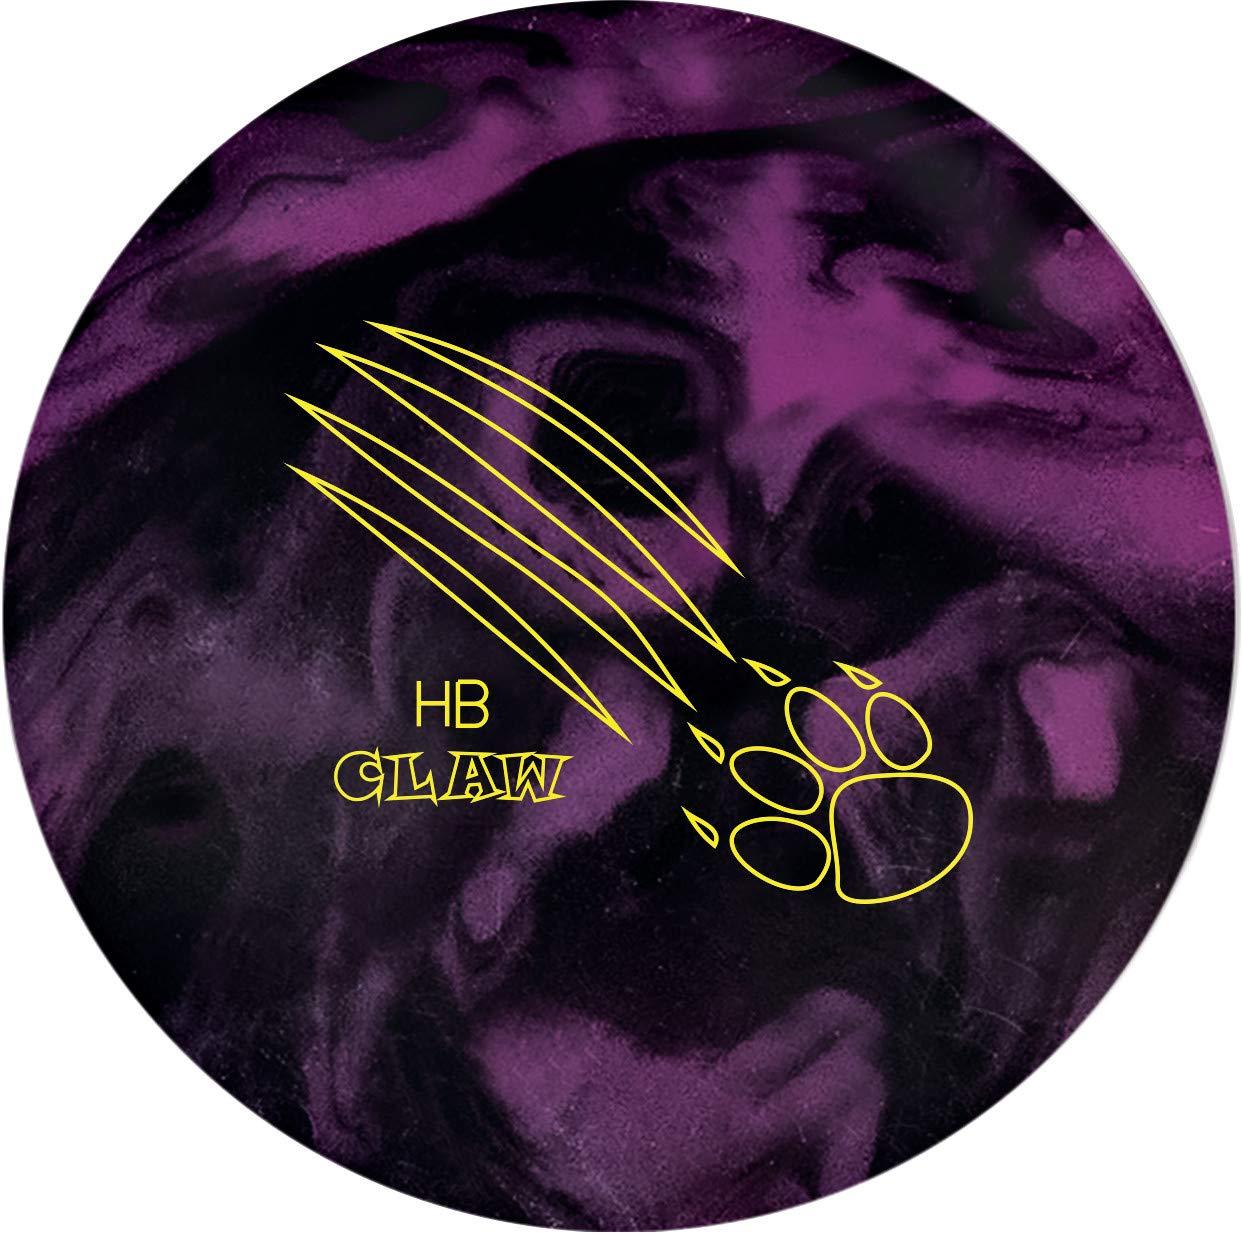 900 Global Honey Badger Claw ボーリングボール - ブラック/パープル 15 lb.  B07JW6DK9L